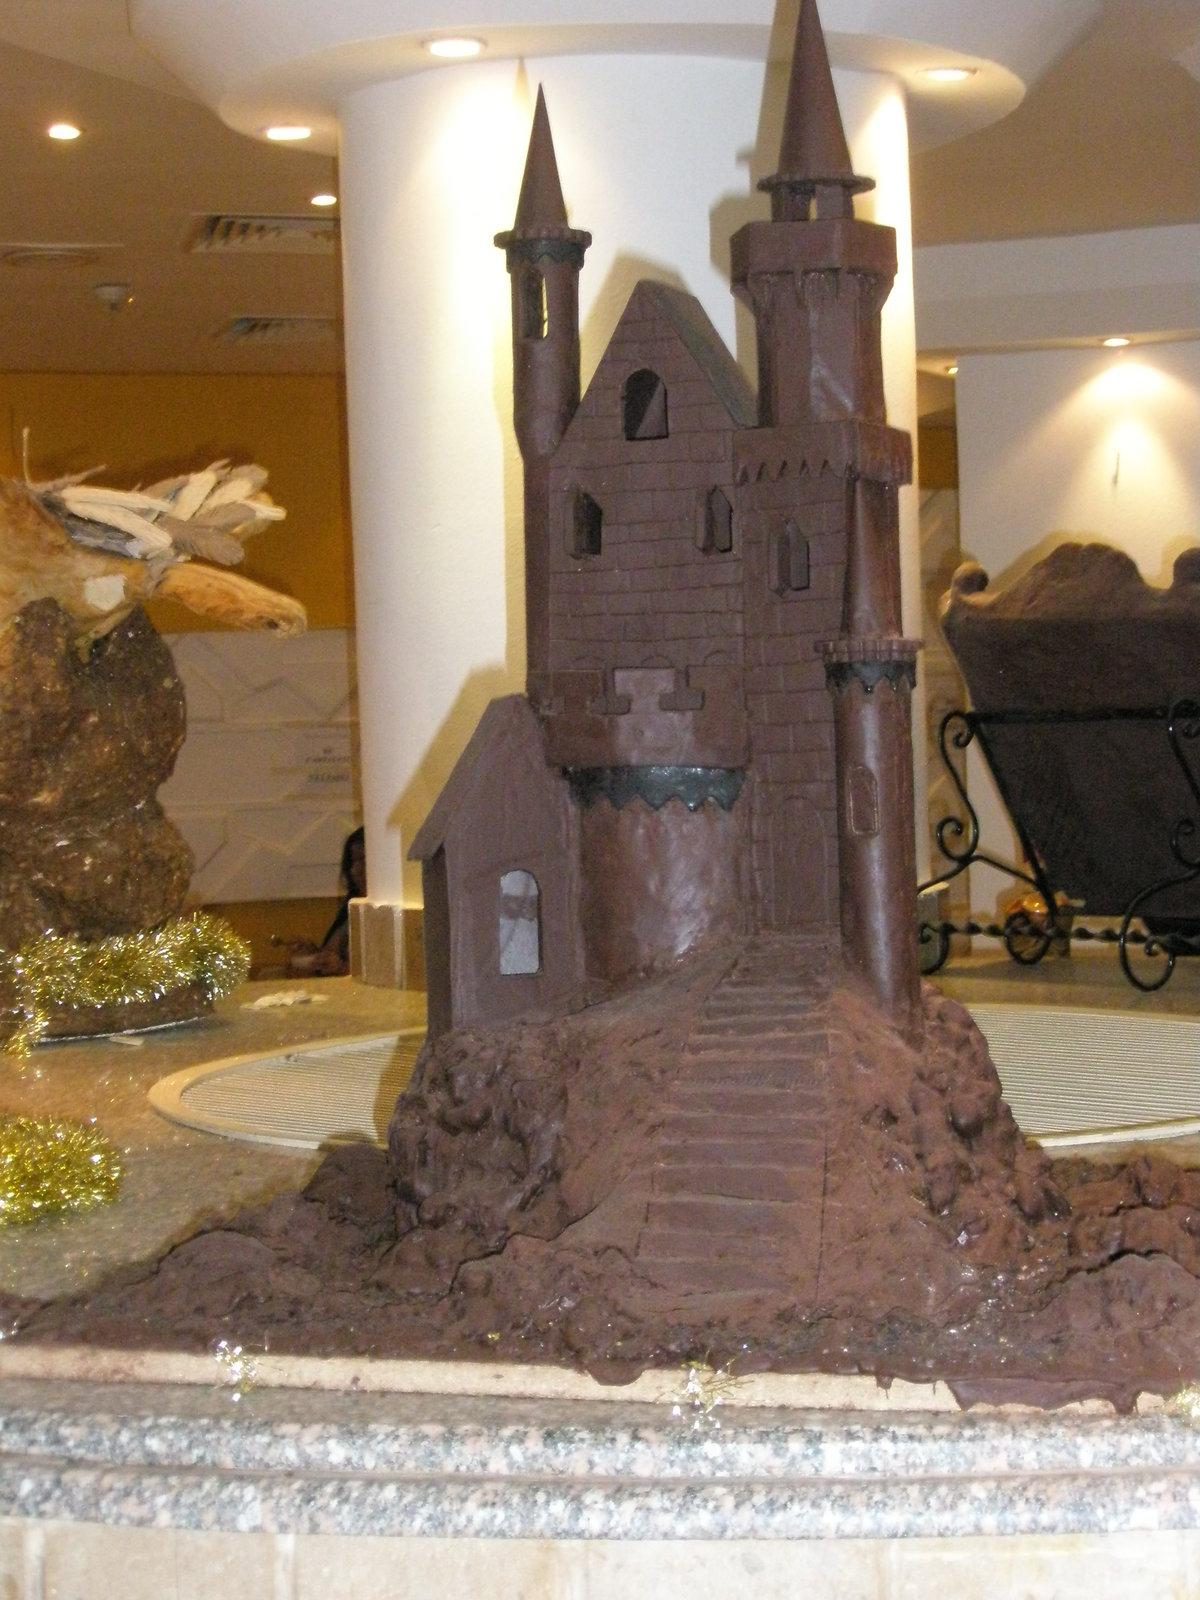 окон замок из шоколада картинки фиксаторов